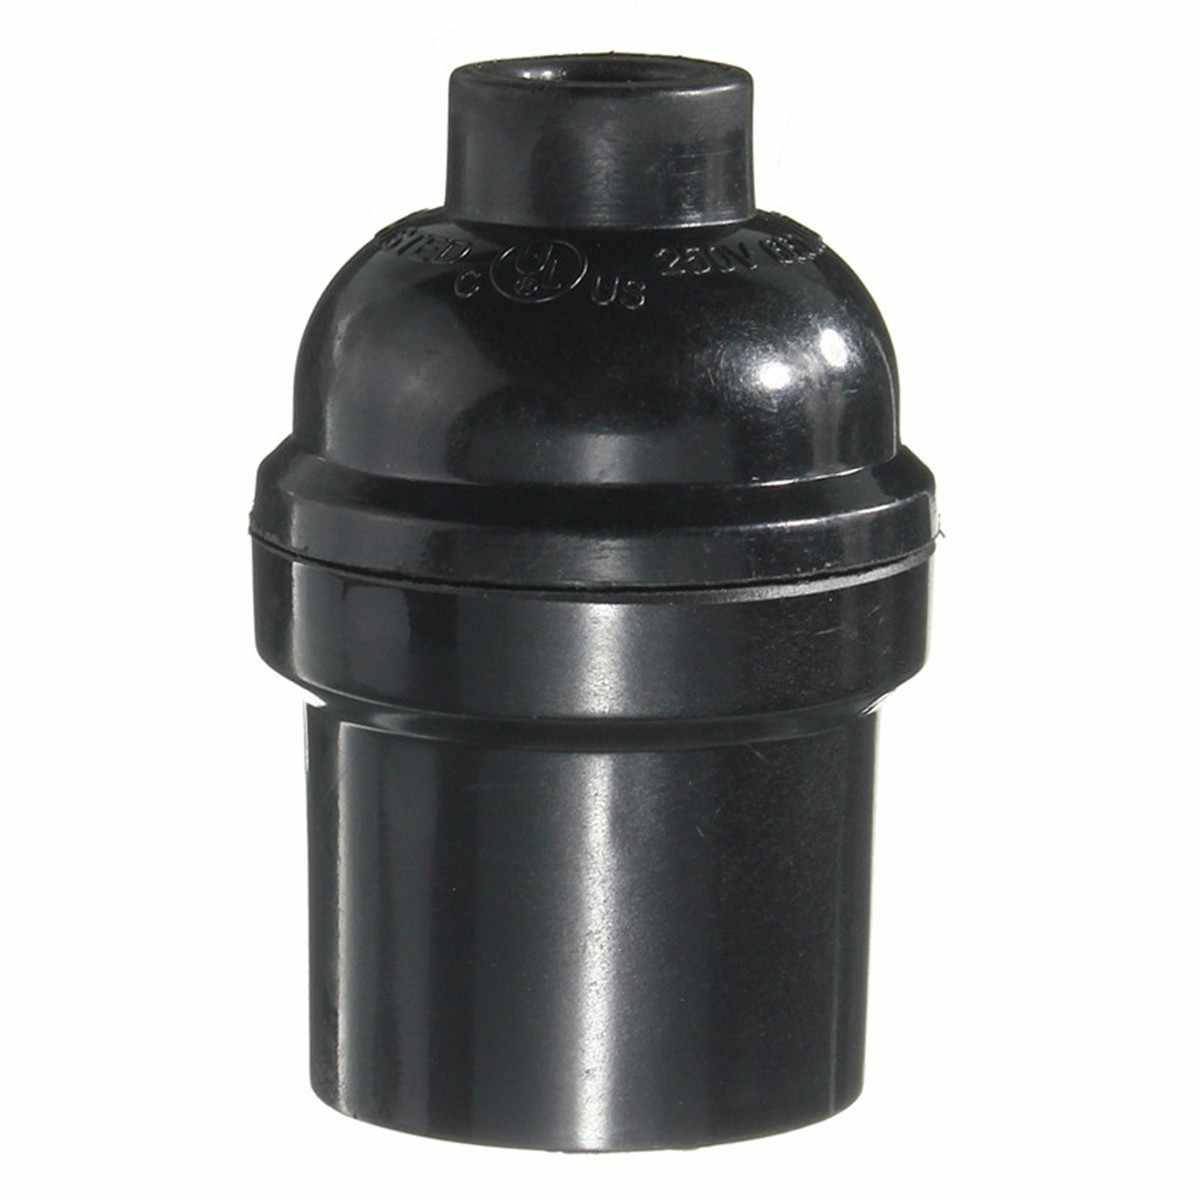 Lamp Base E27/E26 4A 250W Light Bulb Socket Lamp Base Holder Pendant Screw Cap Vintage Black 250V